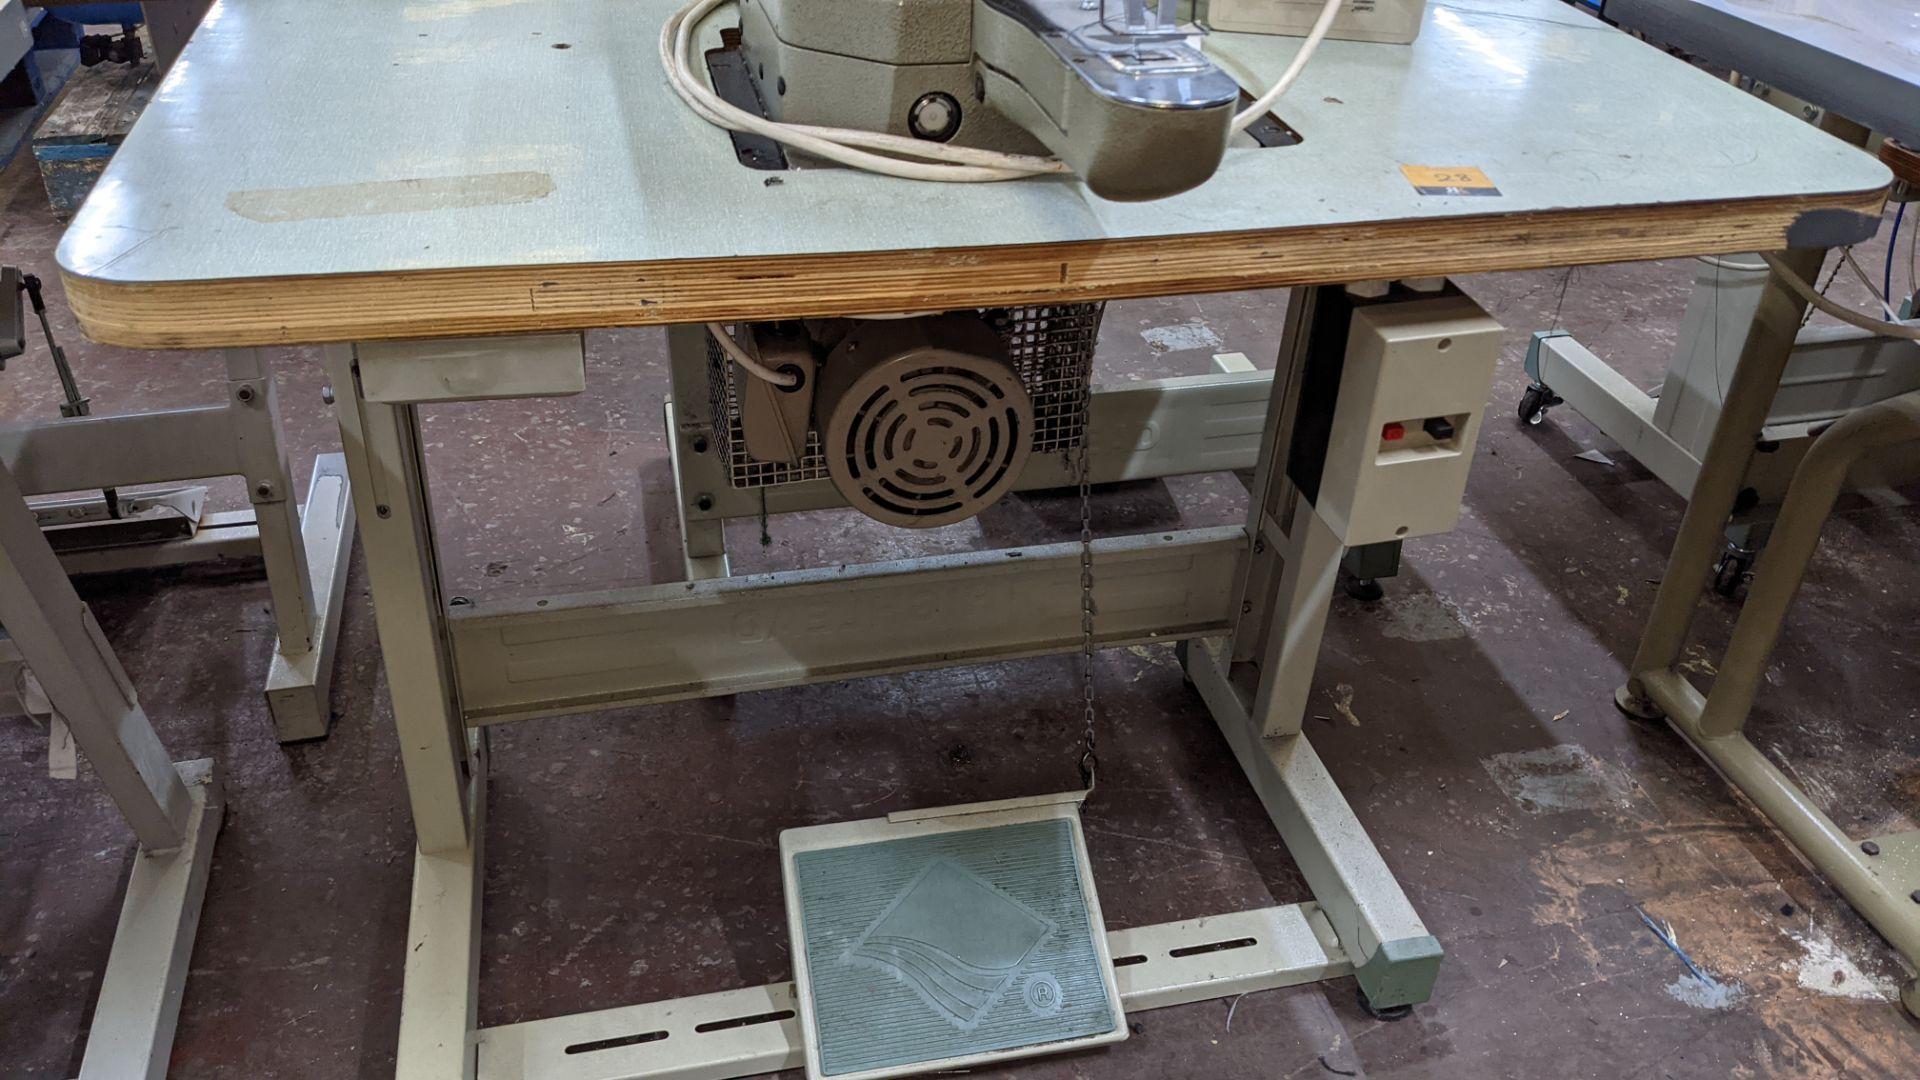 Brother bar tack sewing machine model LK3-B430-2 - Image 12 of 15